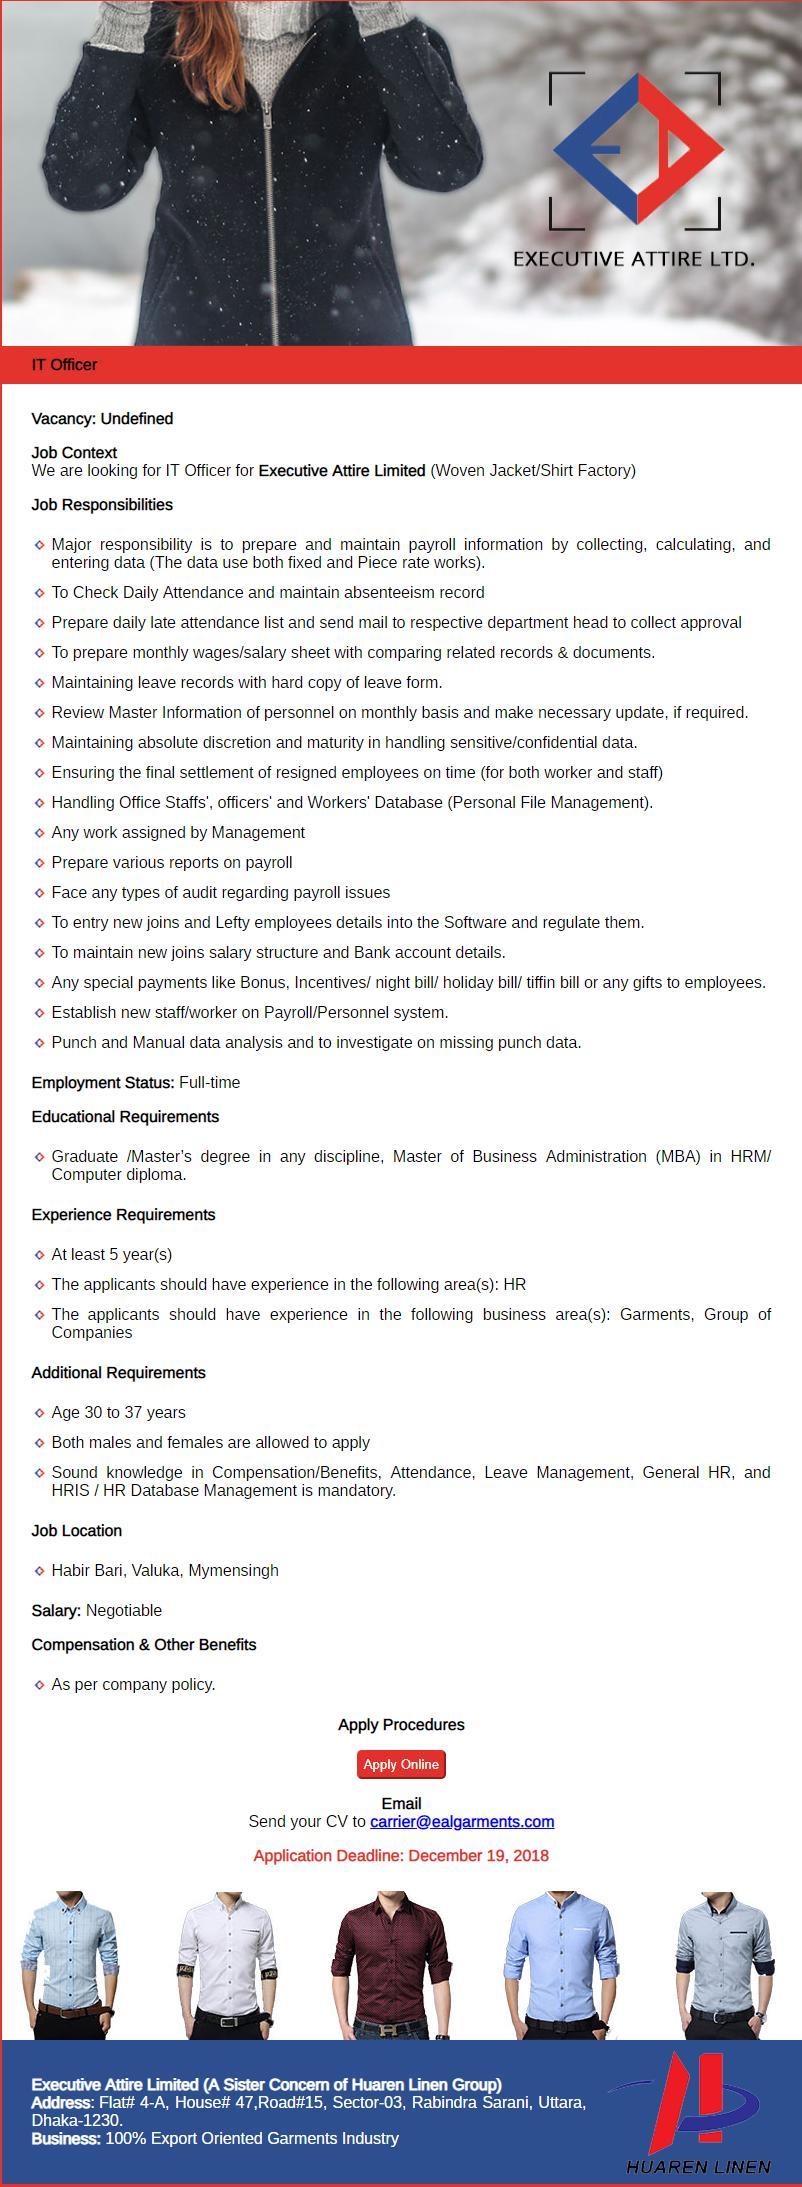 Executive Attire Ltd Job Circular 2018